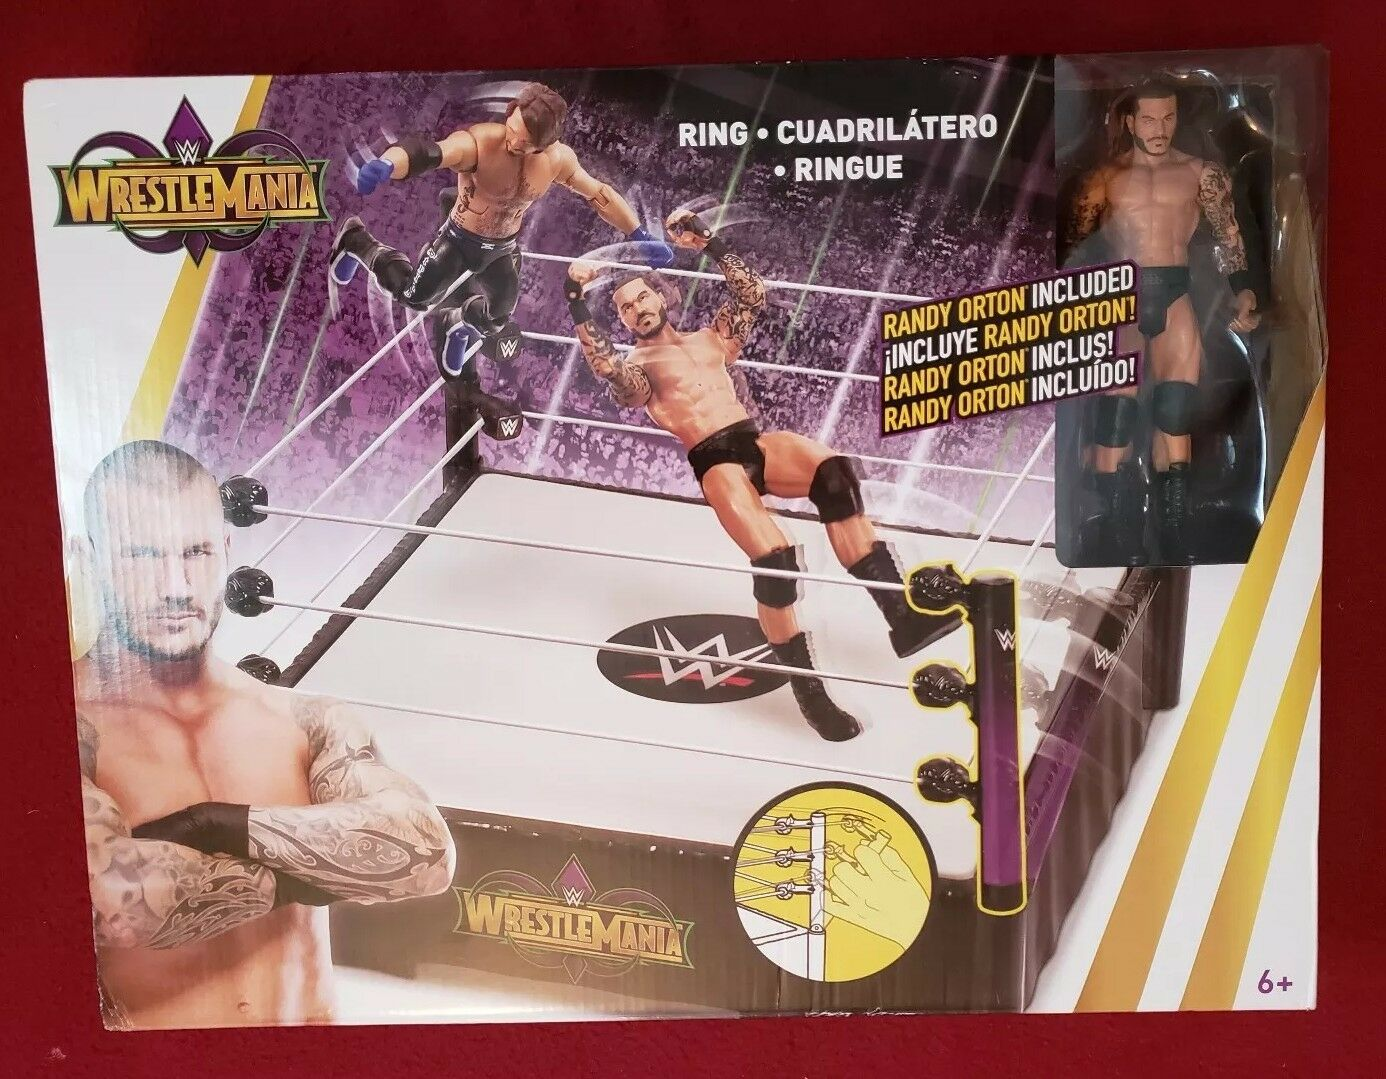 2017 WWE Mattel Wrestlemania 34 Playset Ring W/ Randy Orton Figure MISB